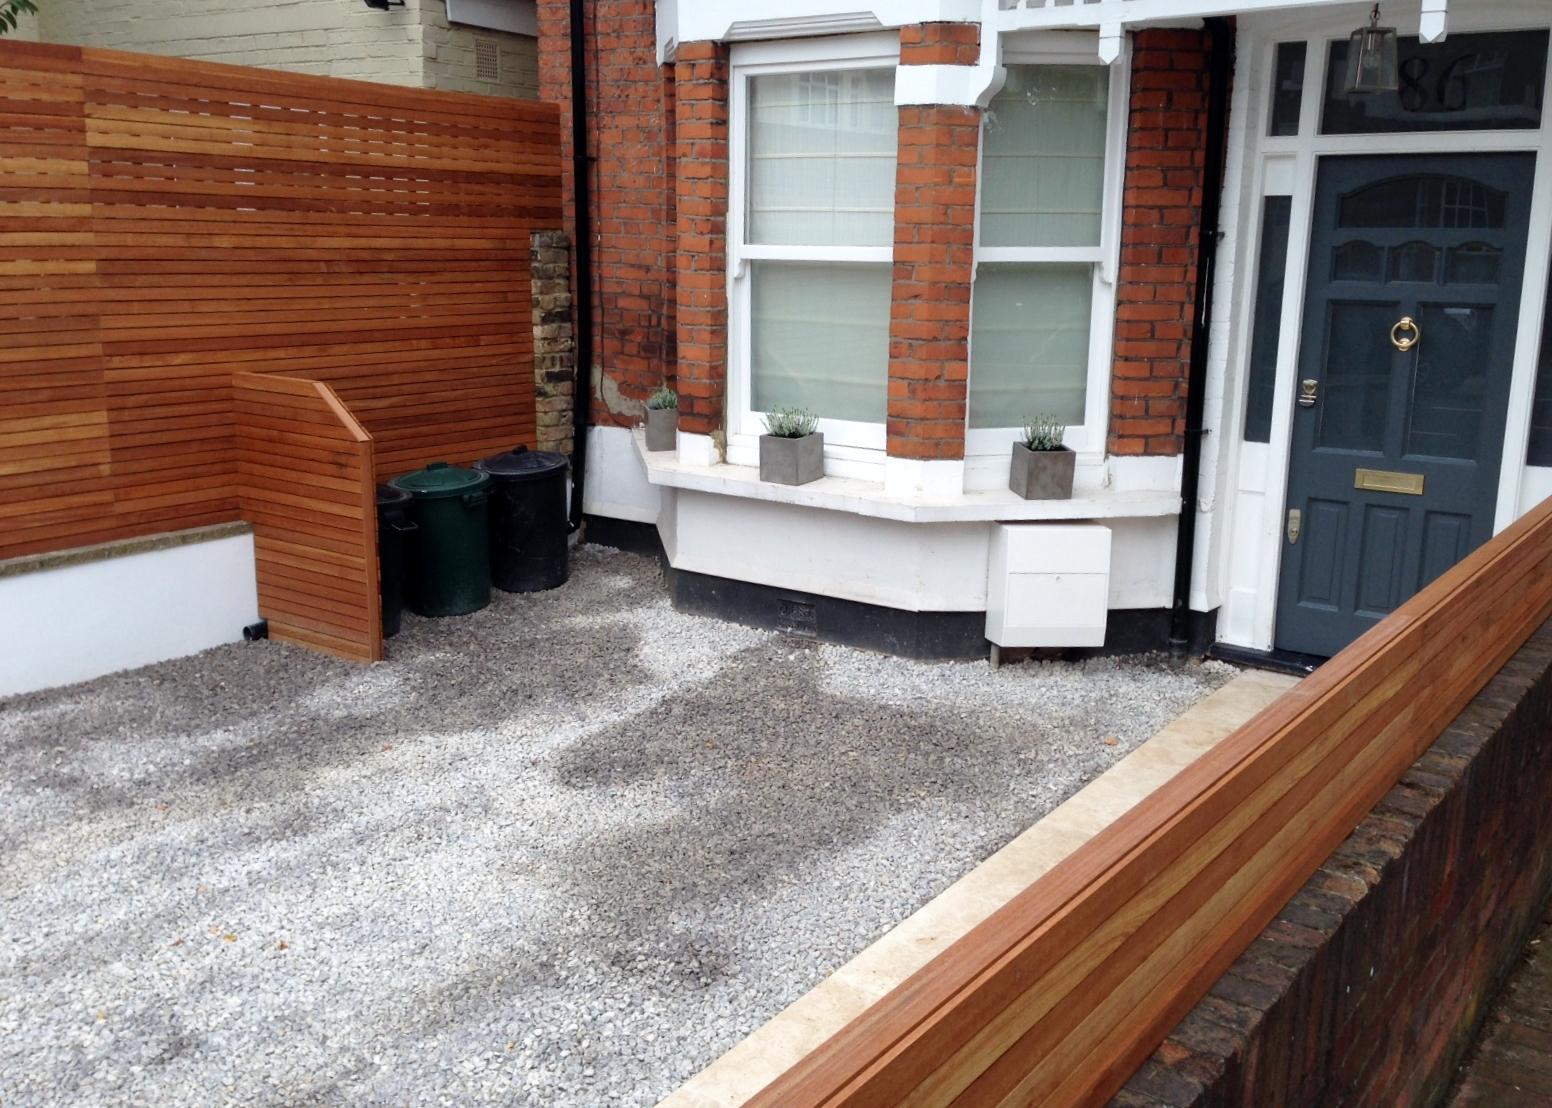 front garden drivewat gravel travertine paving path hardwood privacy screen trellis tooting london (26)